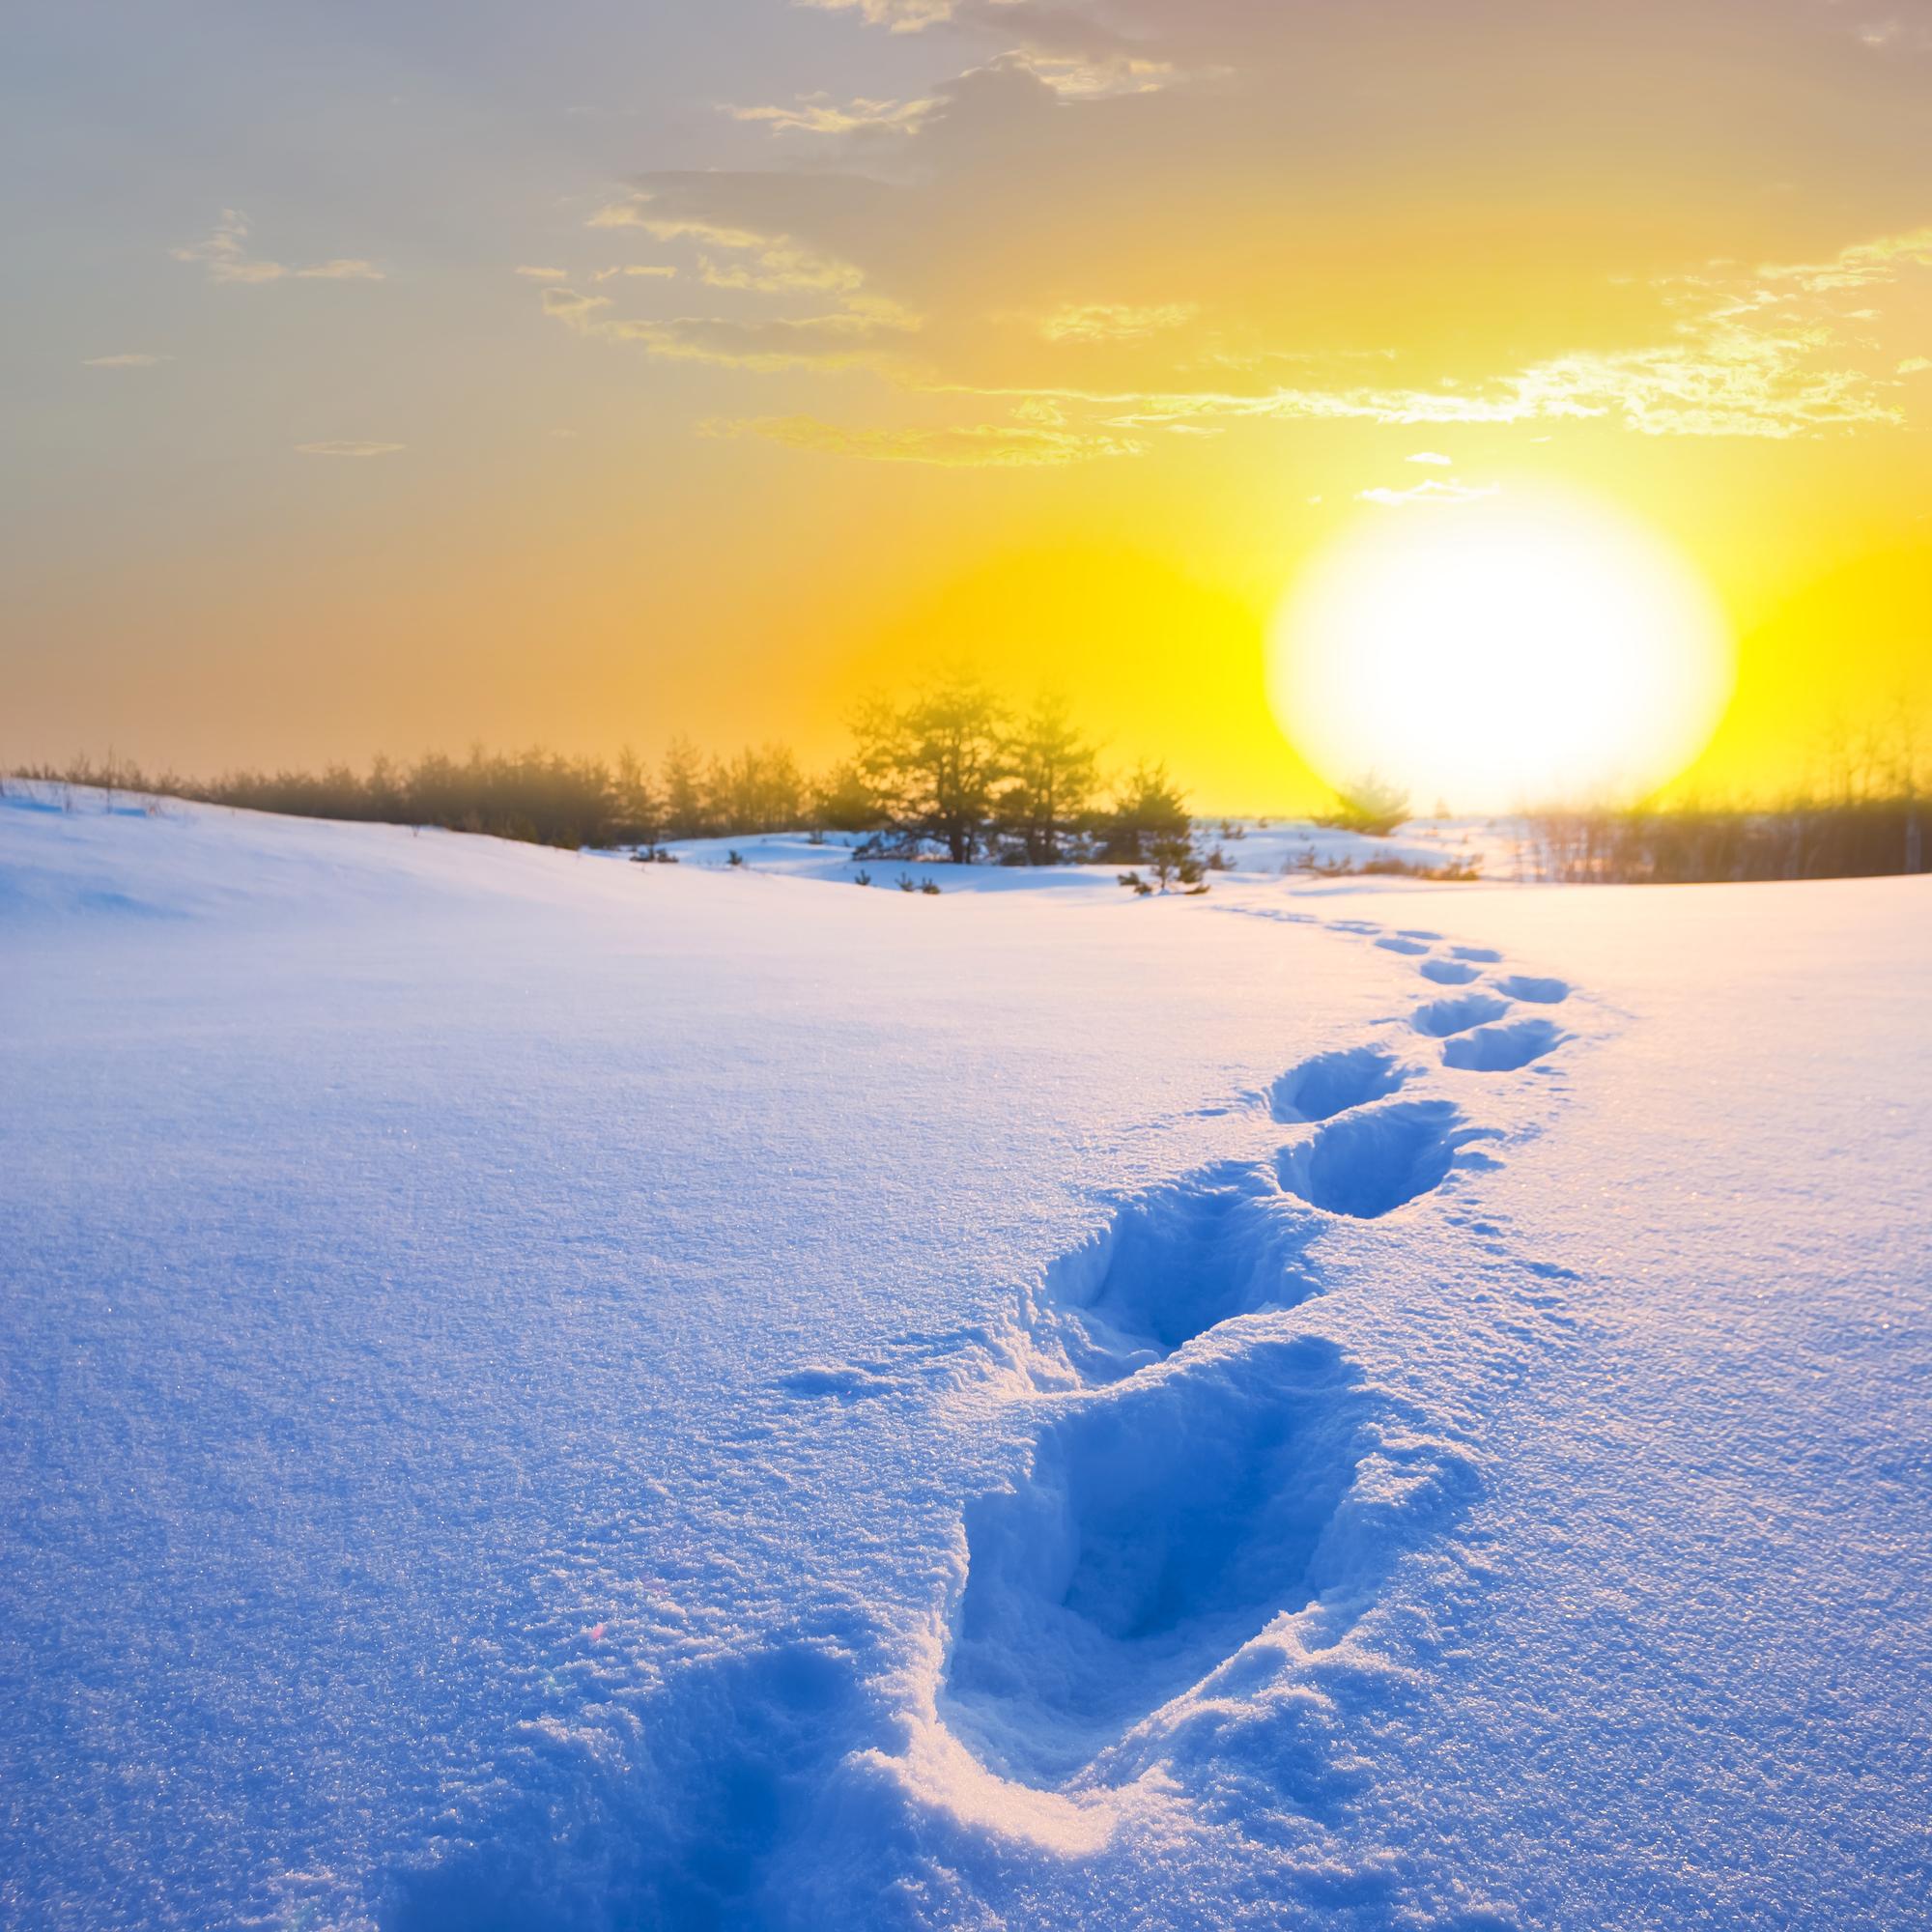 śnieg-na-pustyni.jpg